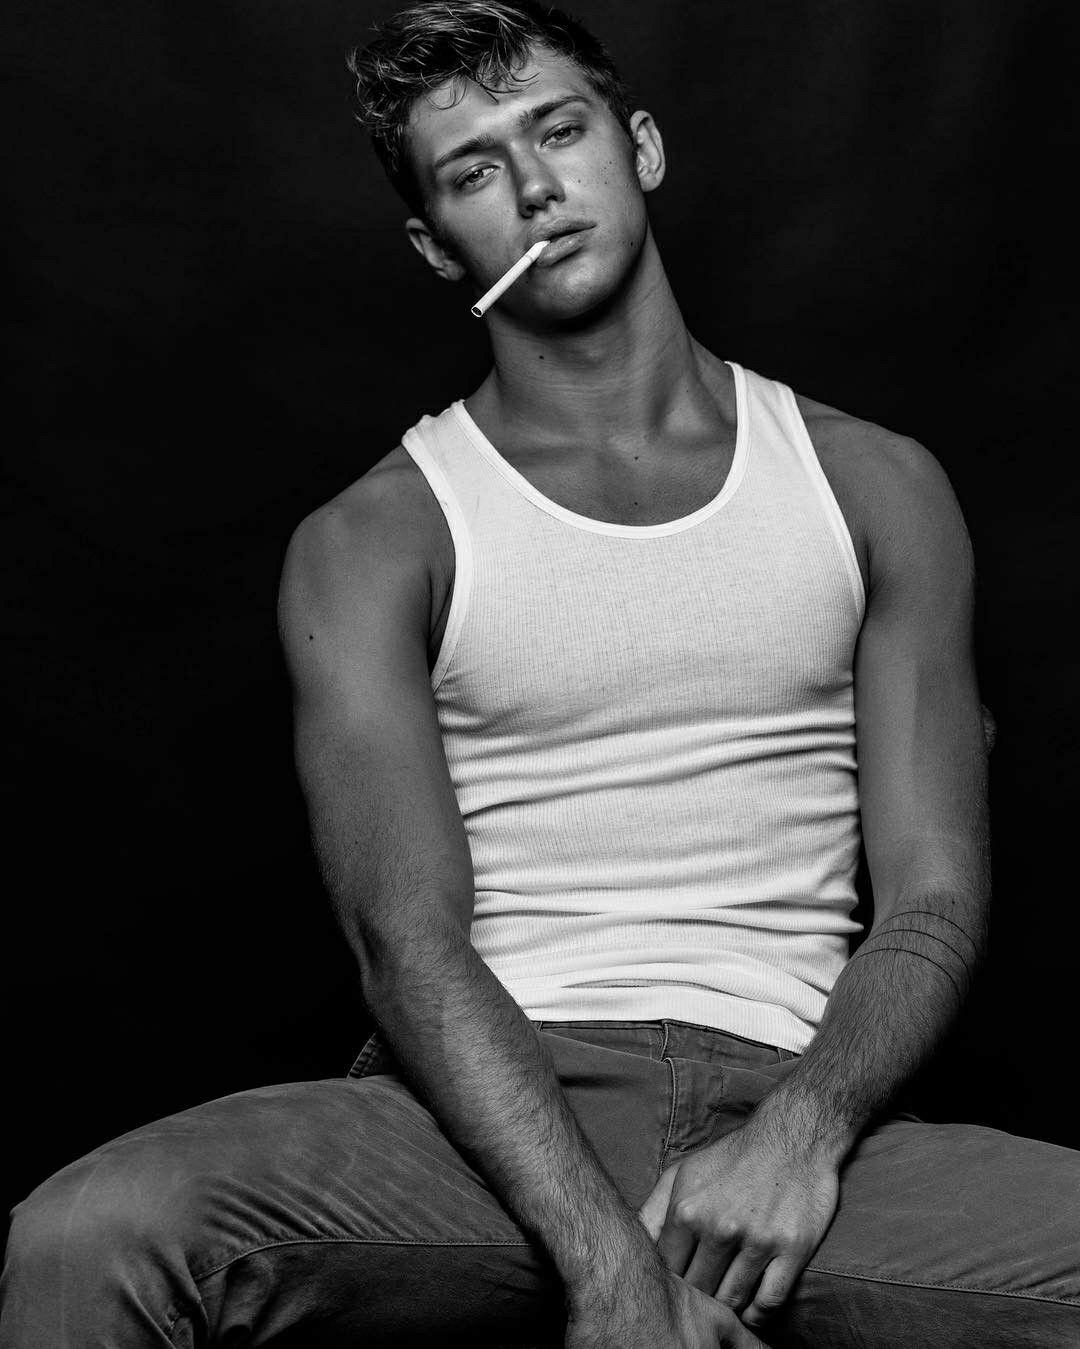 Jacob Dooley | Modelos, Fotos, Instagram